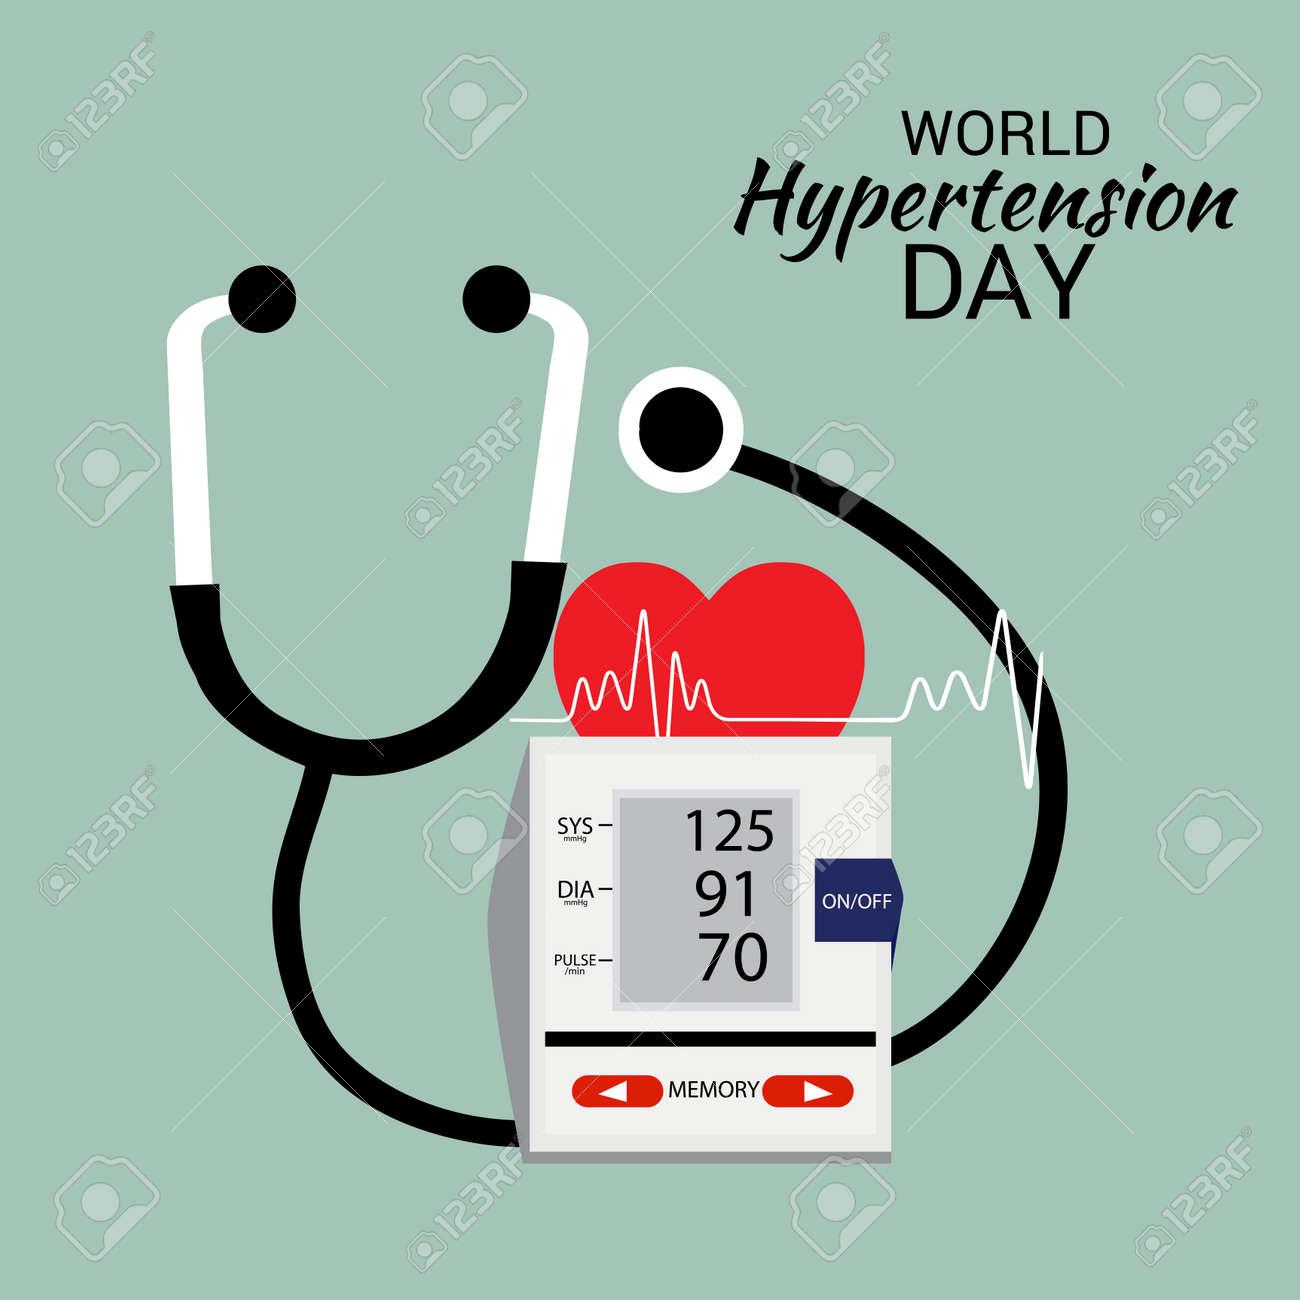 World Hypertension Day. - 101453993